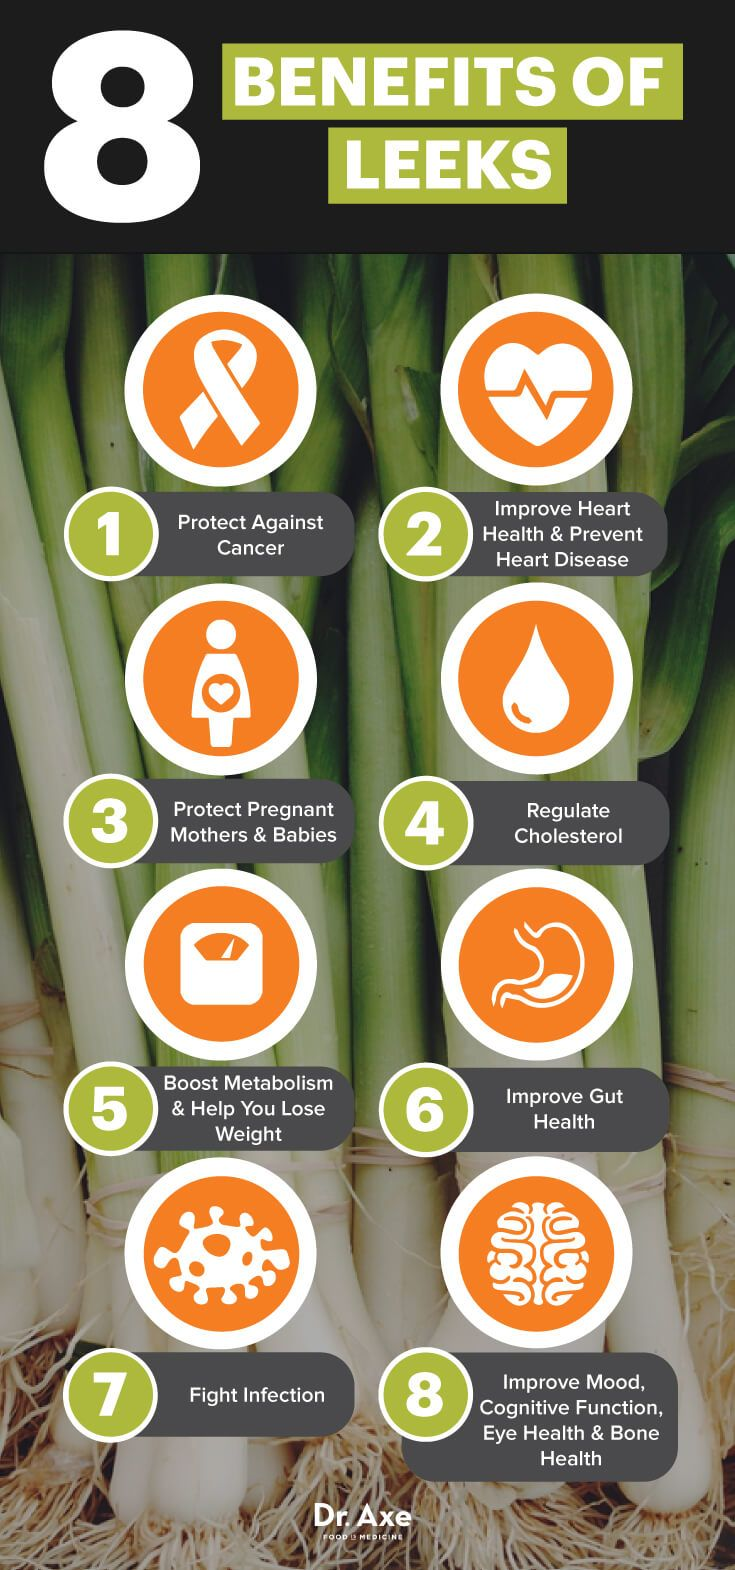 Leeks benefits - Dr. Axe http://www.draxe.com #health #holistic #natural